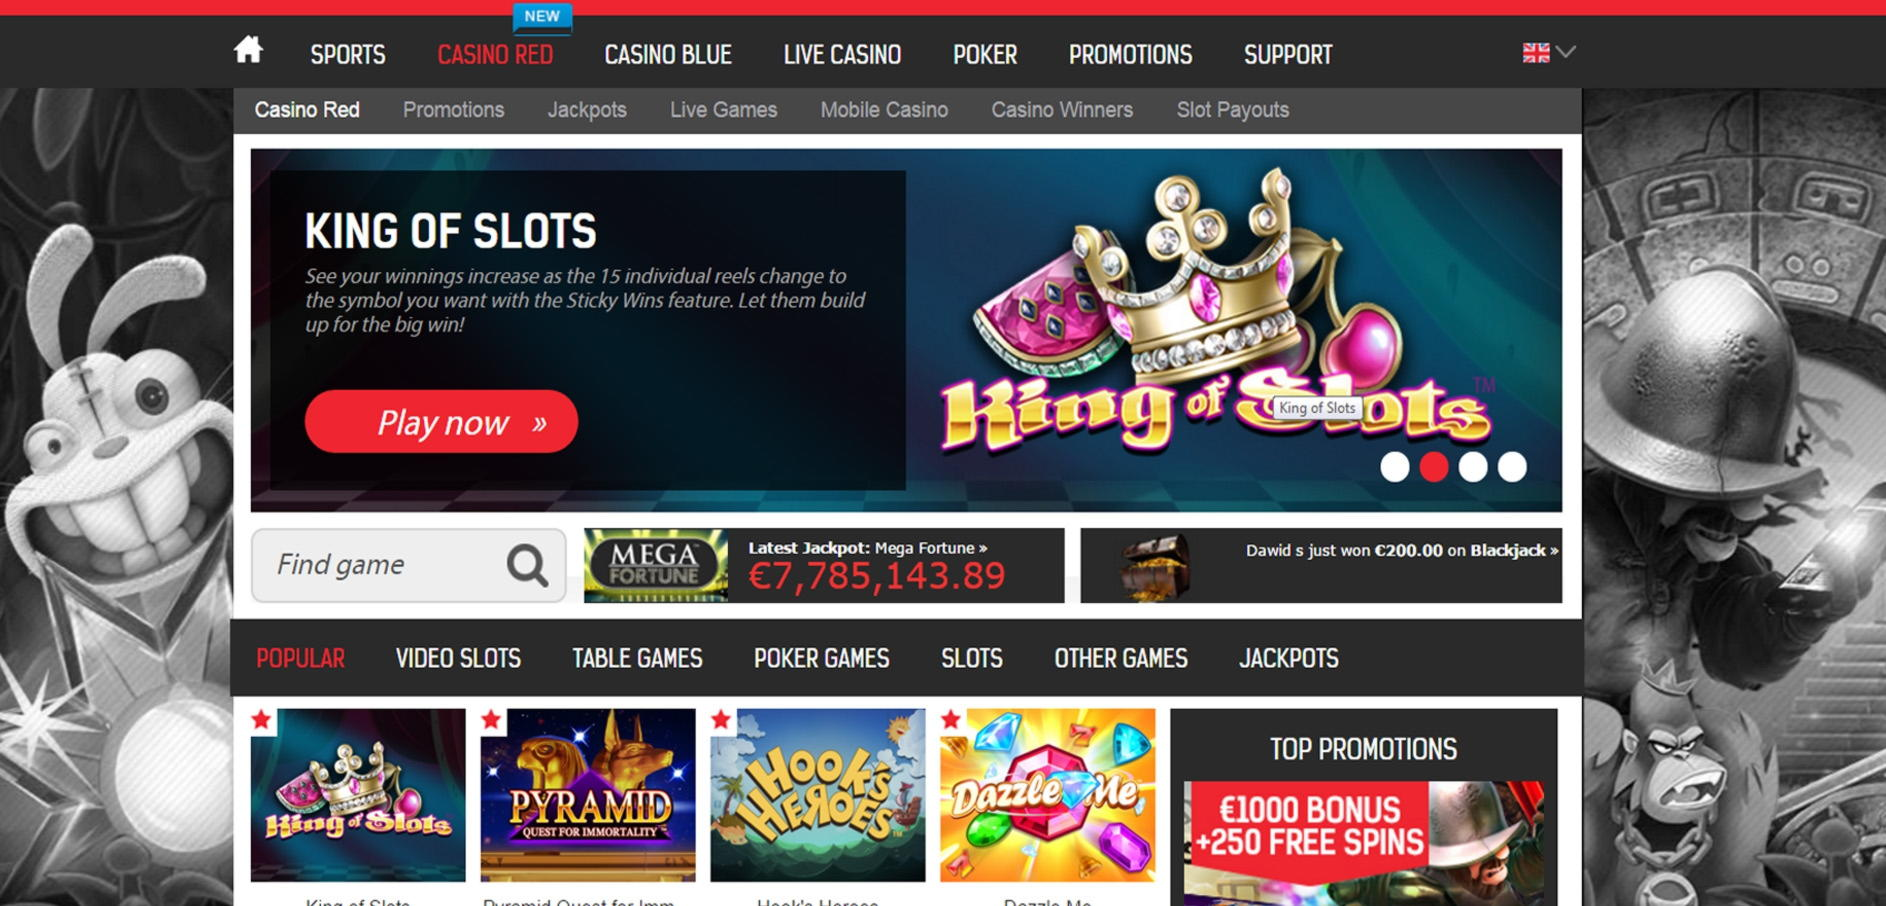 265% First deposit bonus at Party Casino